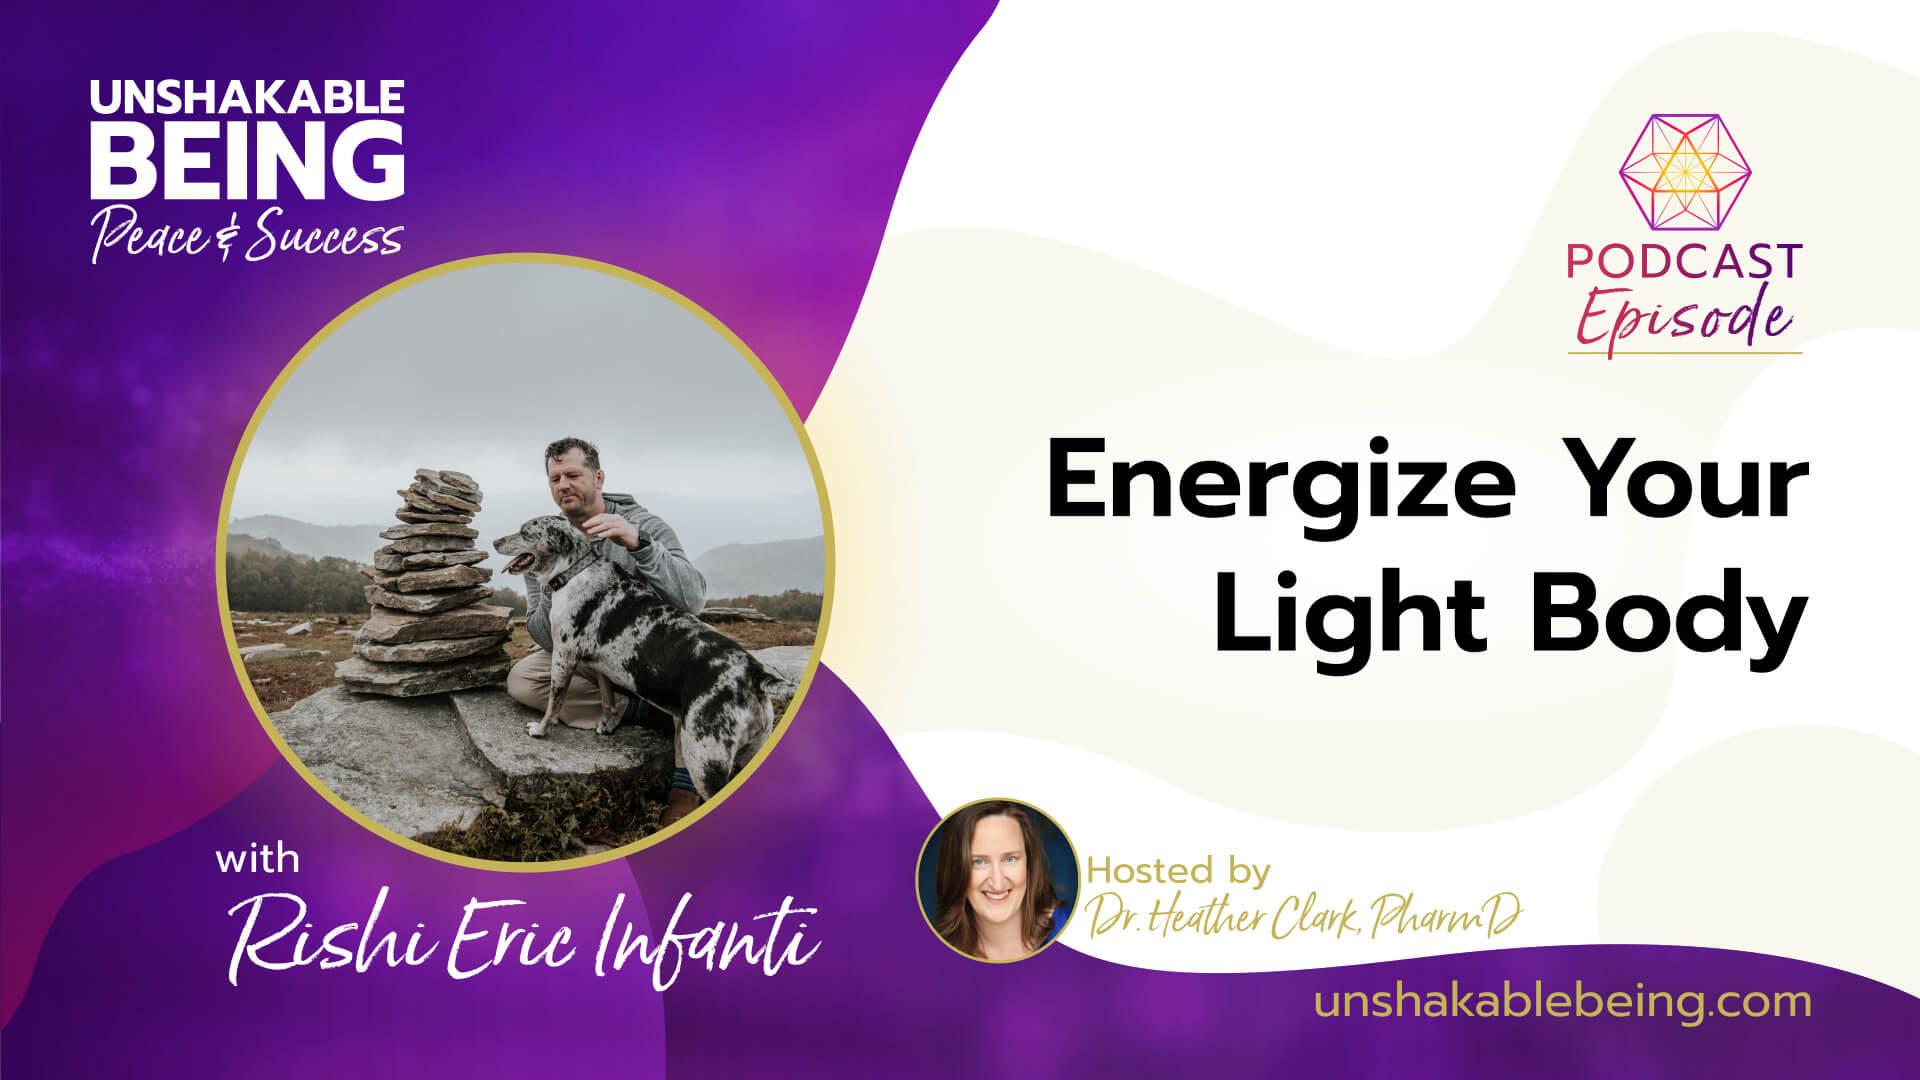 Energize Your Light Body | Rishi Eric Infanti